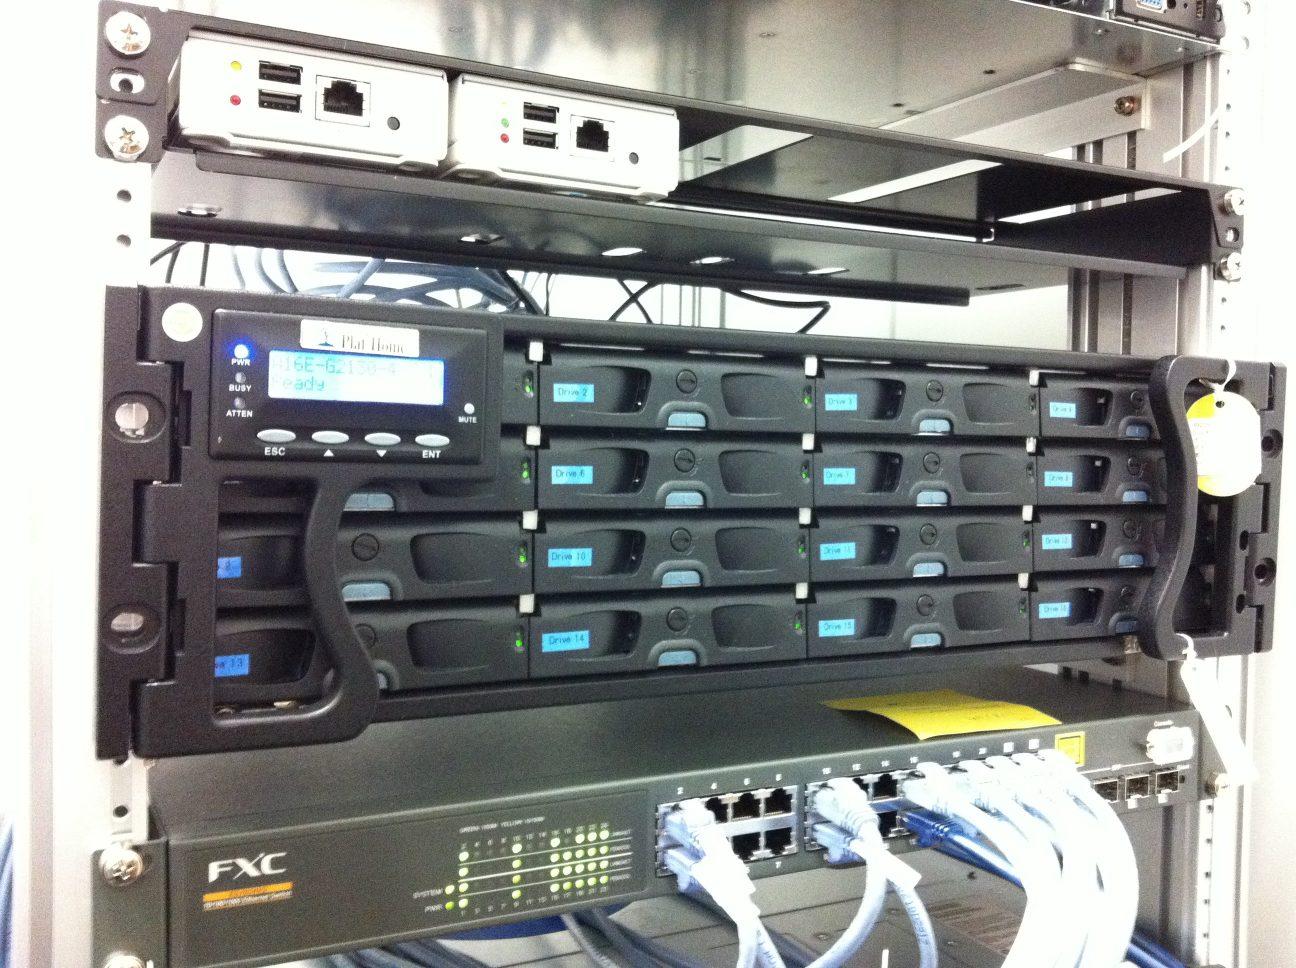 Rackmount RAID storage